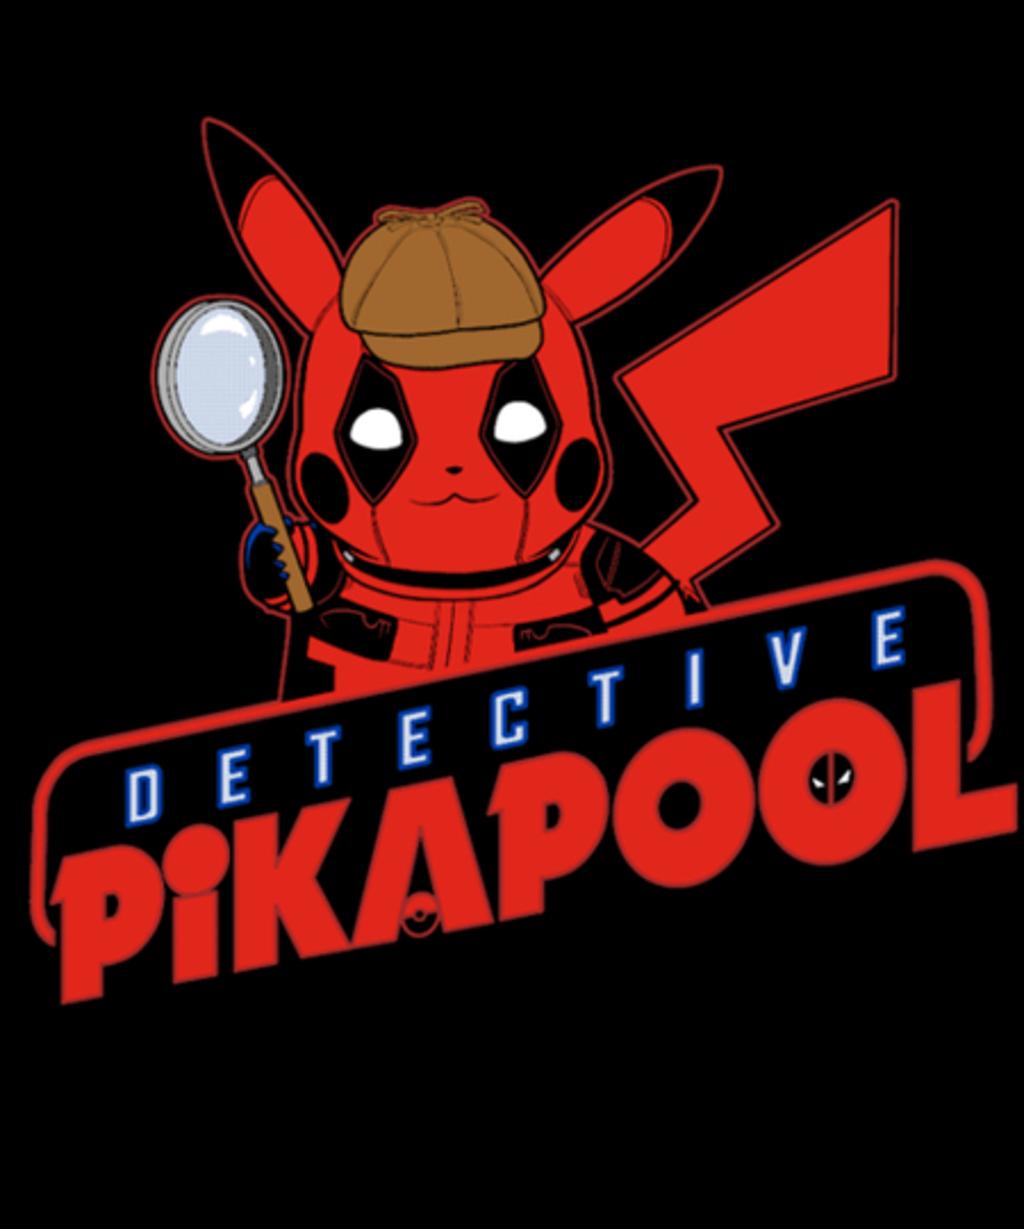 Qwertee: Detective Pikapool